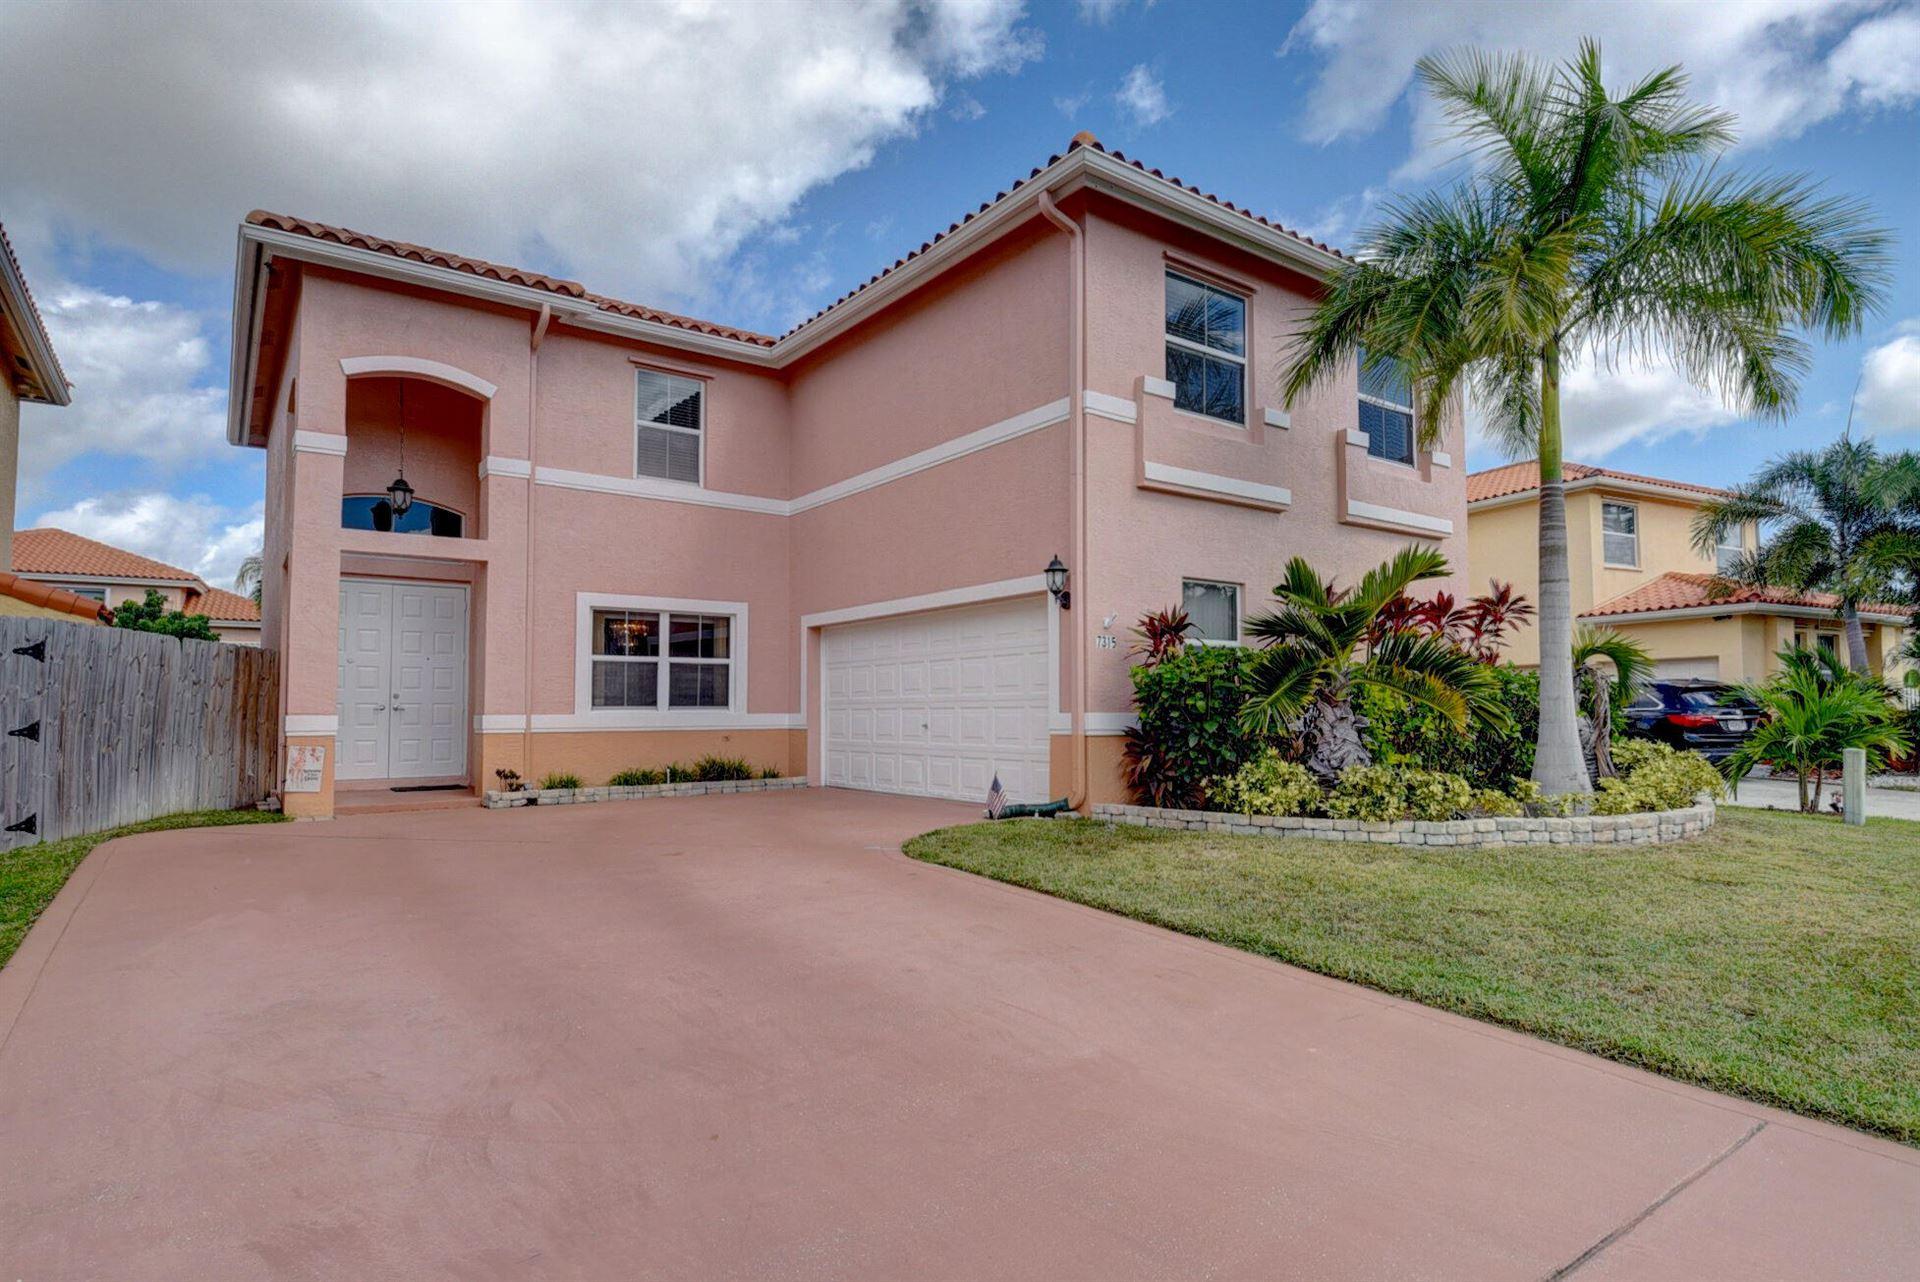 7315 Spinnaker Bay Drive, Lake Worth, FL 33467 - MLS#: RX-10753865